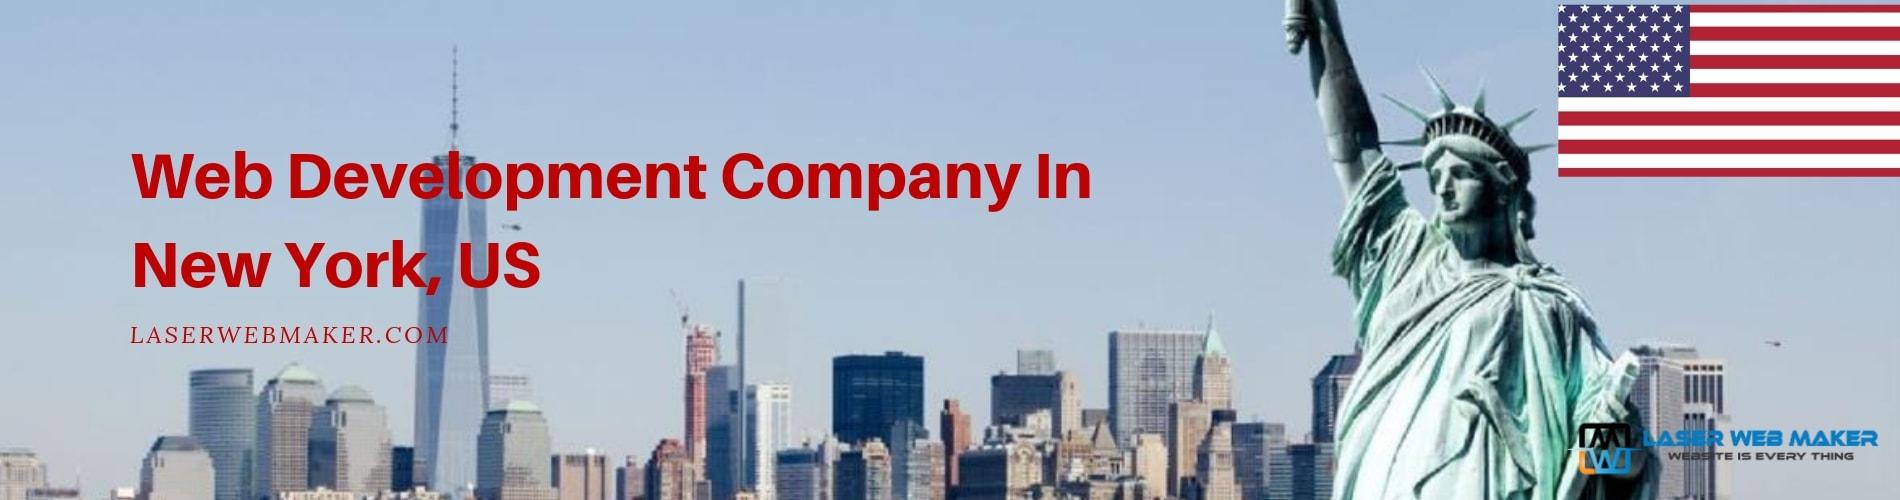 web development company in new york USA